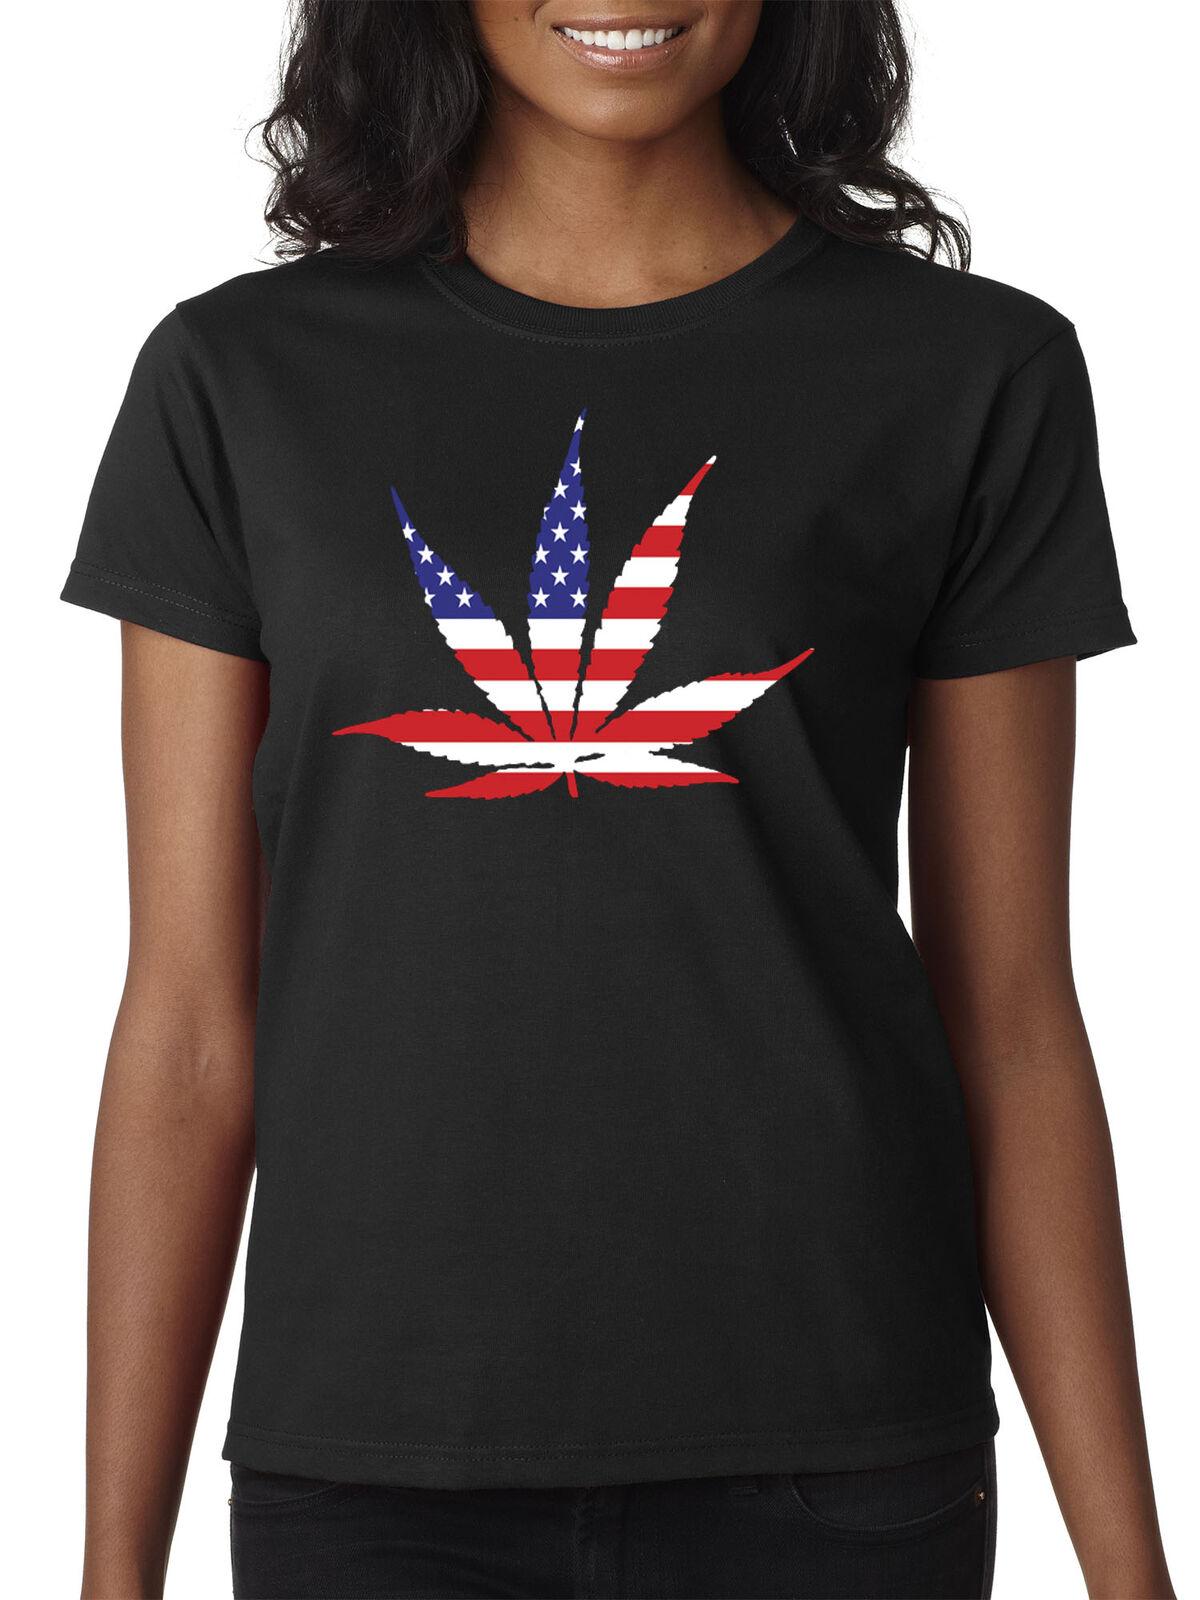 New Way 1493 - Women's T-Shirt American Pot Leaf Marijuana Legalize Weed USA 1